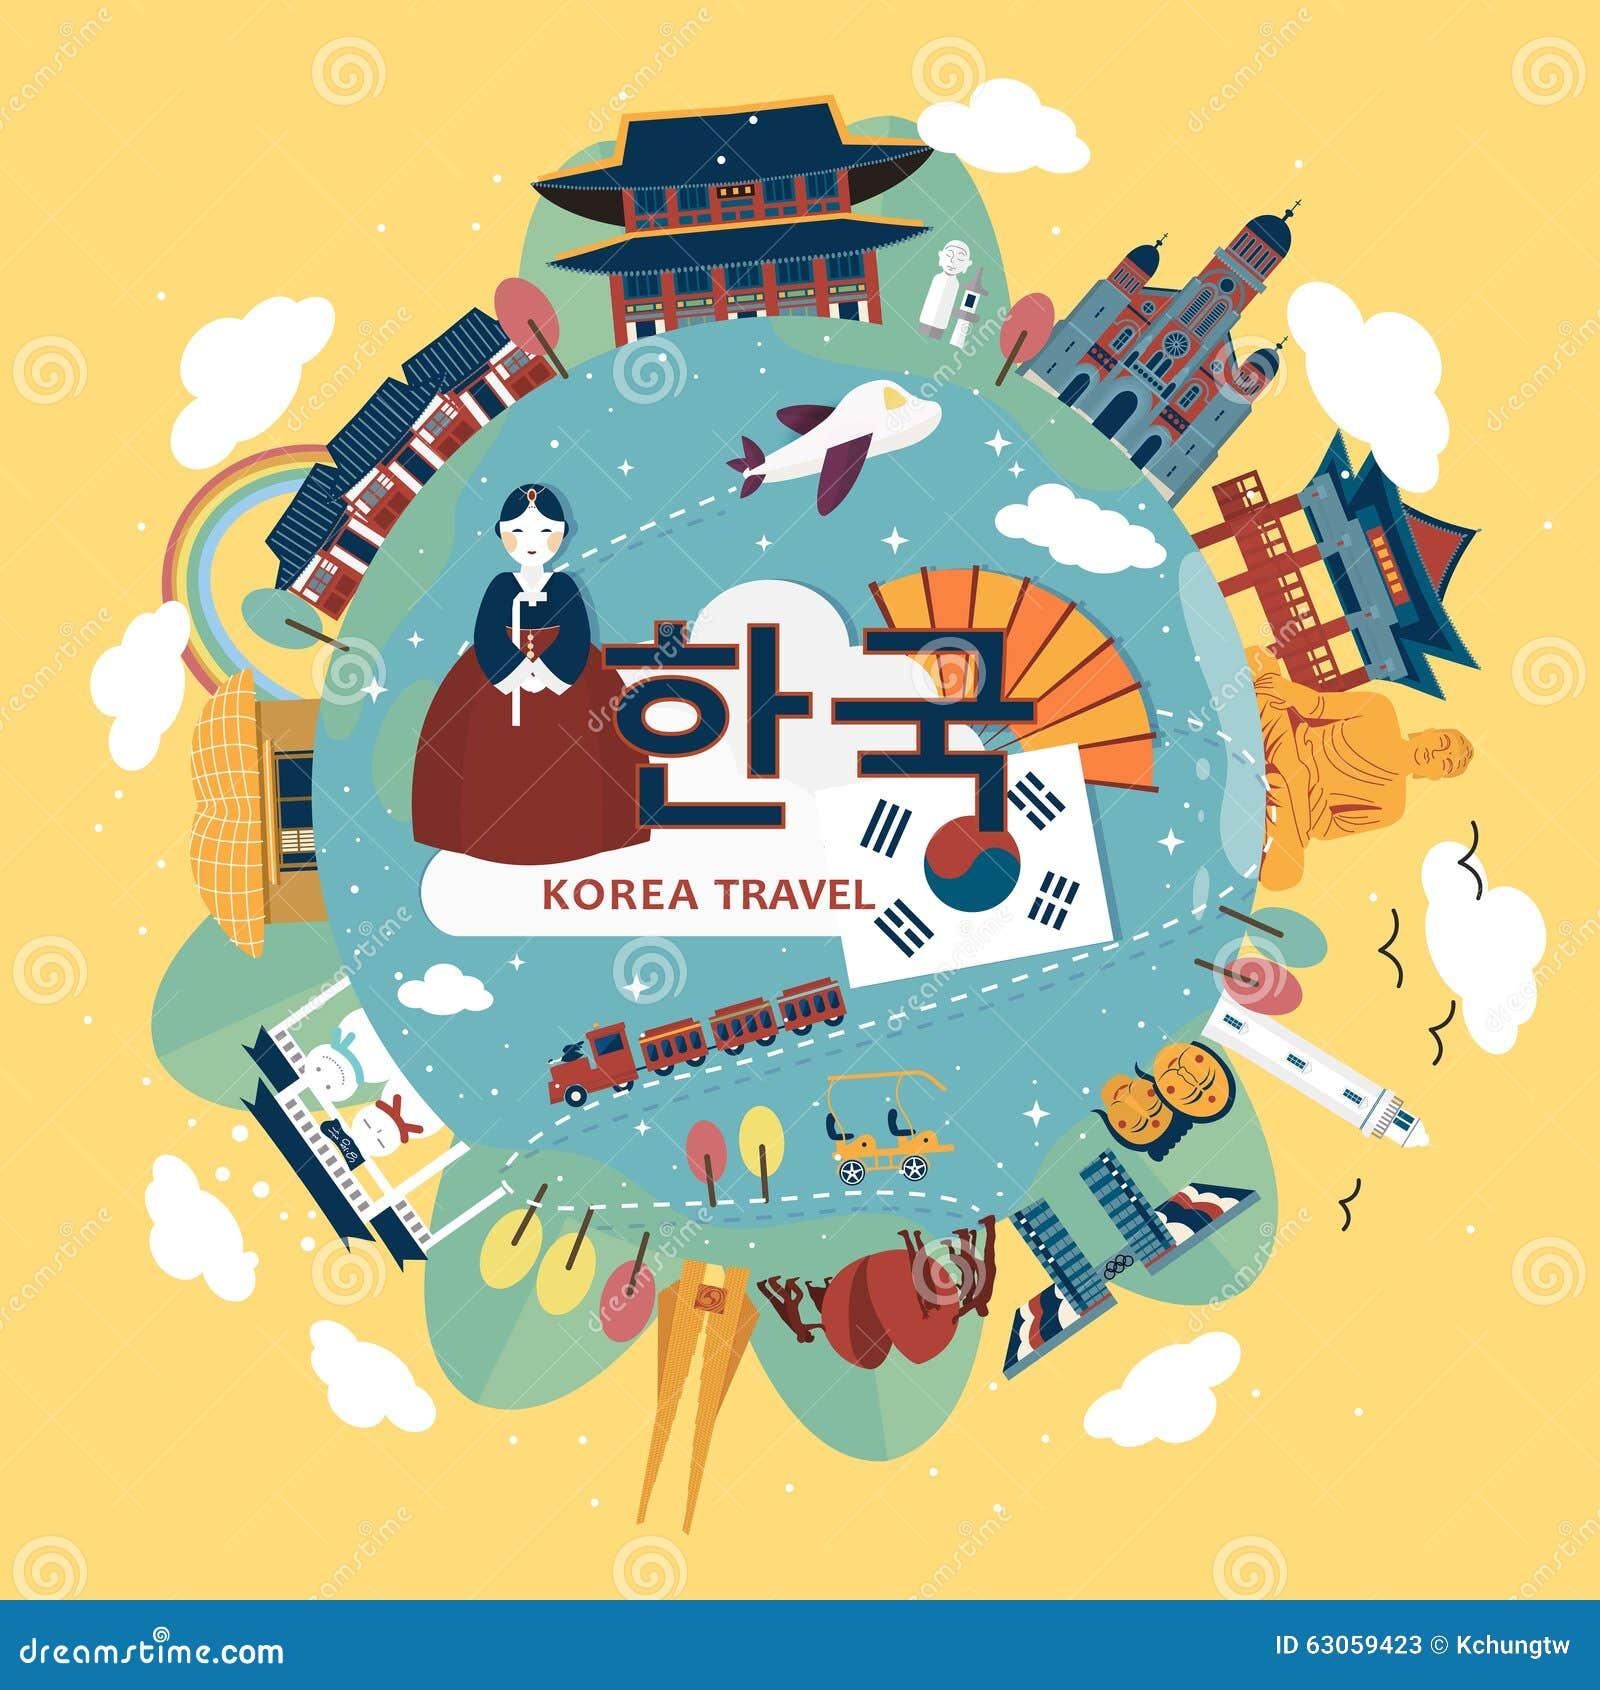 Korean poster design - Flat Korea